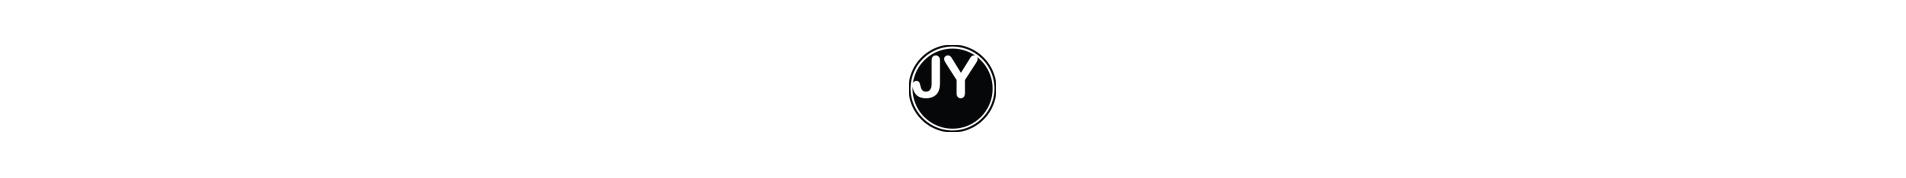 logo - 1SLIDE-SHOW-SS_0000_MB-Artist-page-thumbnails_0000_M.Beerman1